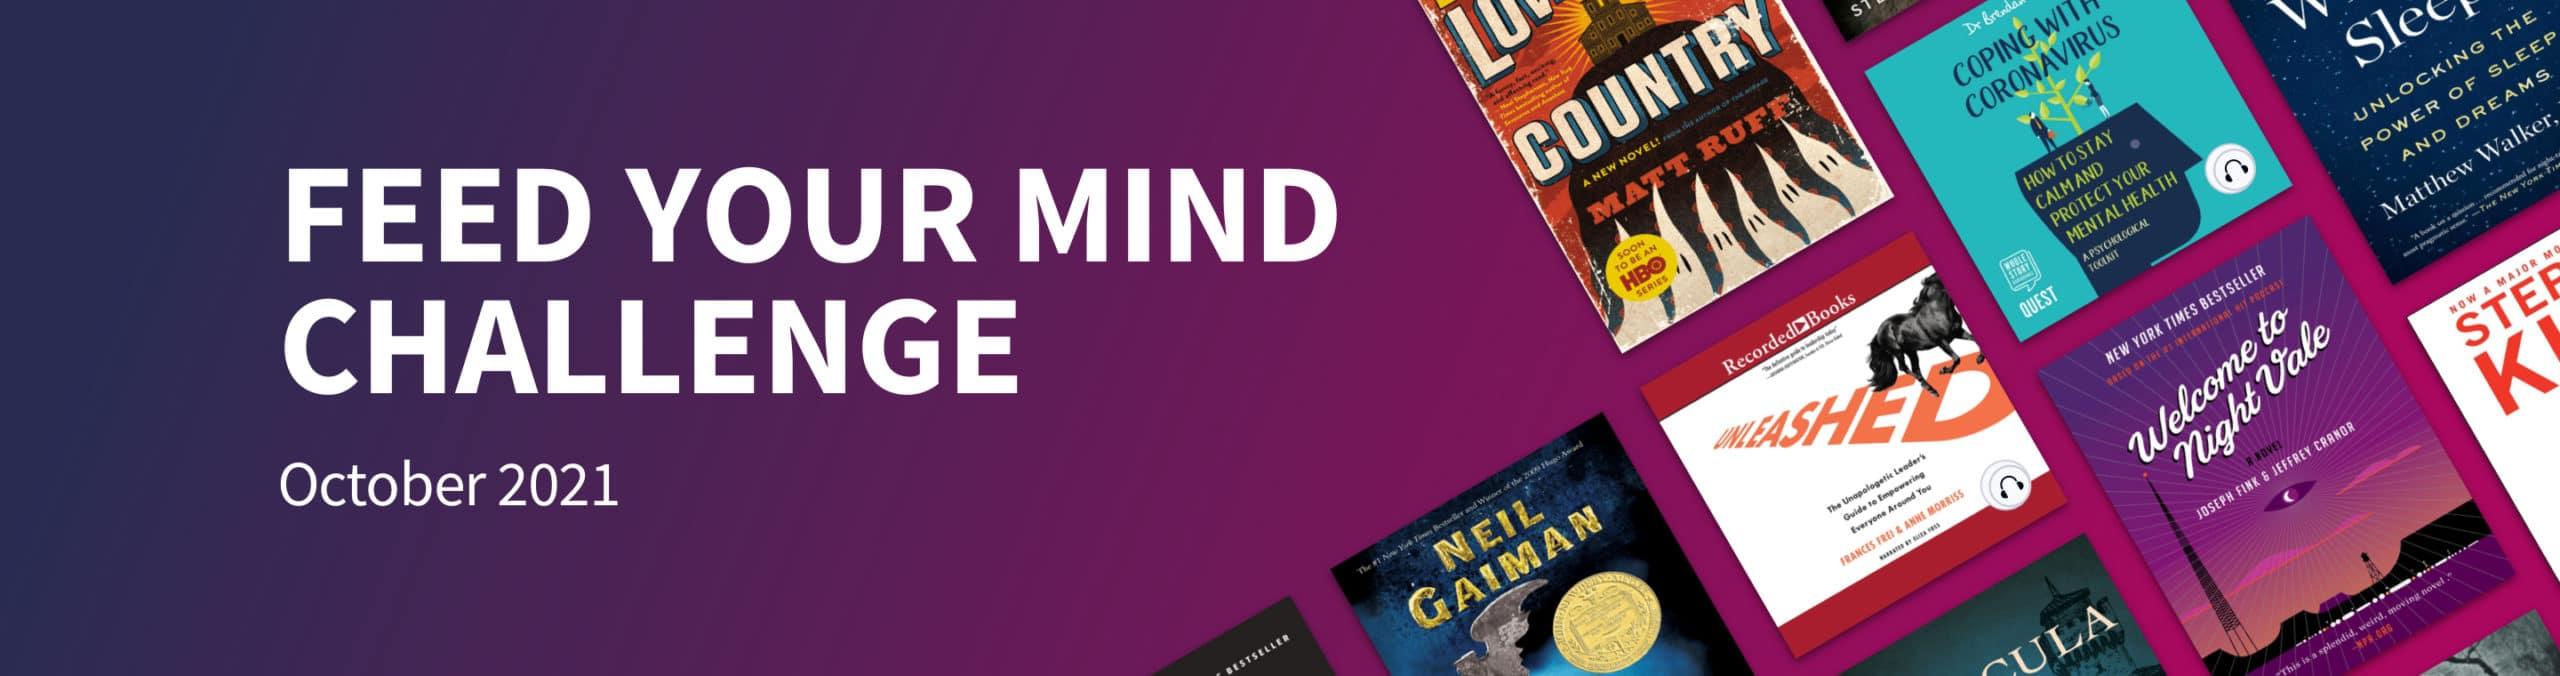 Scribd's October reading challenge